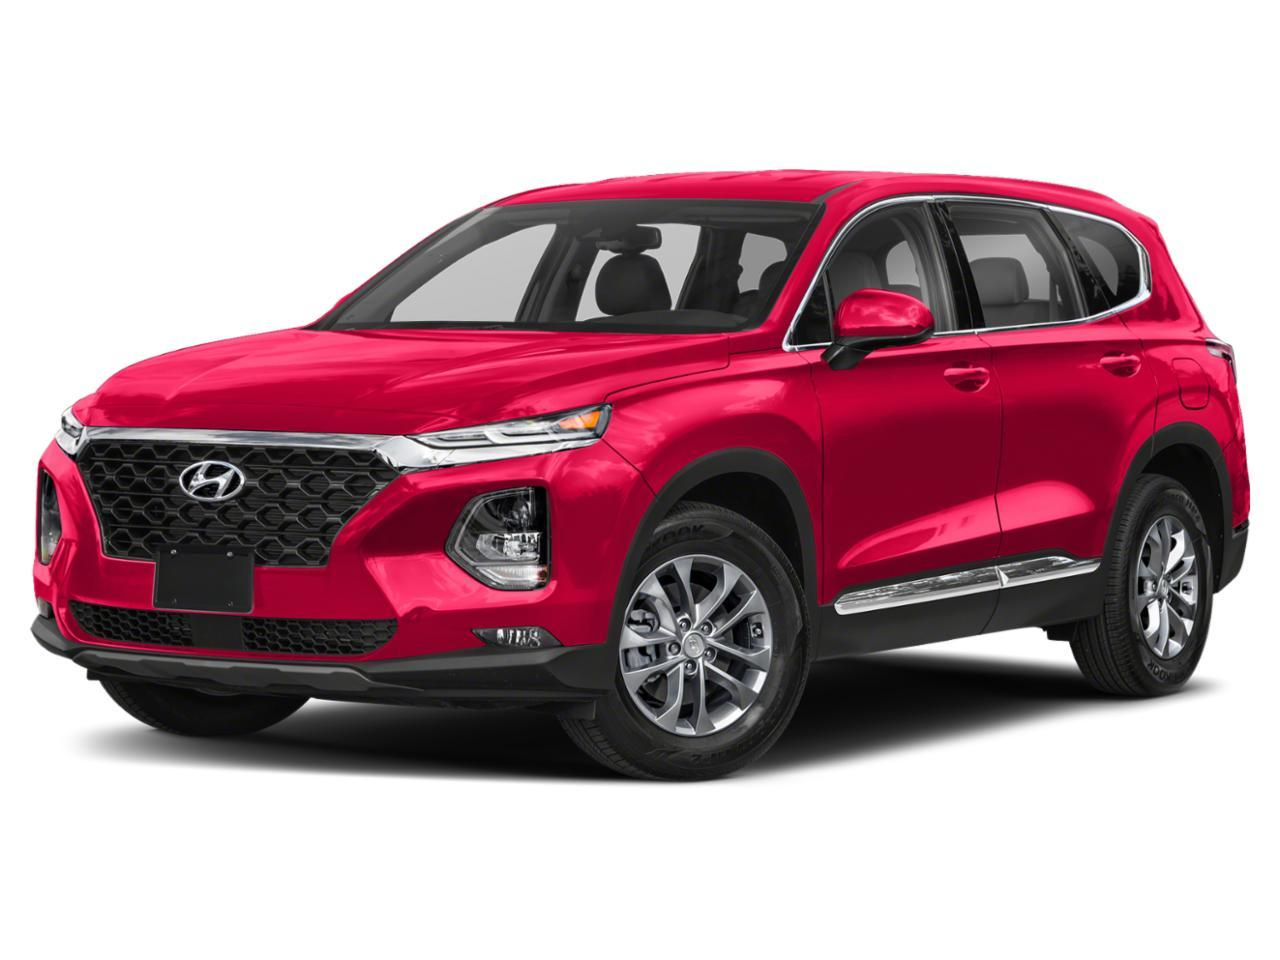 2020 Hyundai Santa Fe Vehicle Photo in Oshkosh, WI 54904